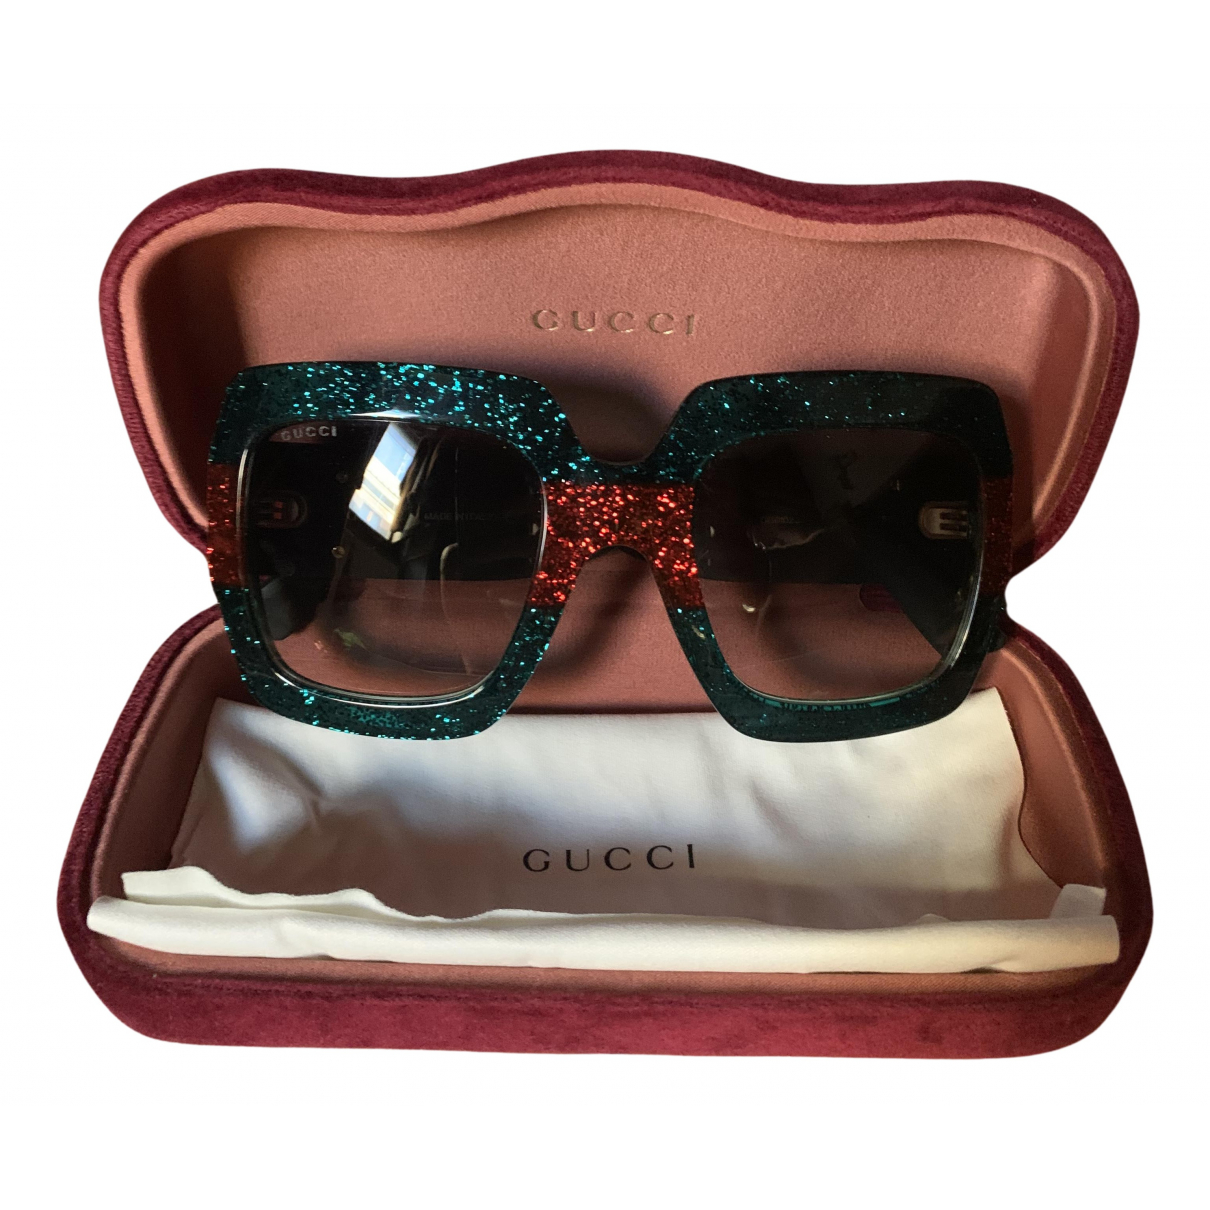 Gucci N Multicolour Sunglasses for Women N